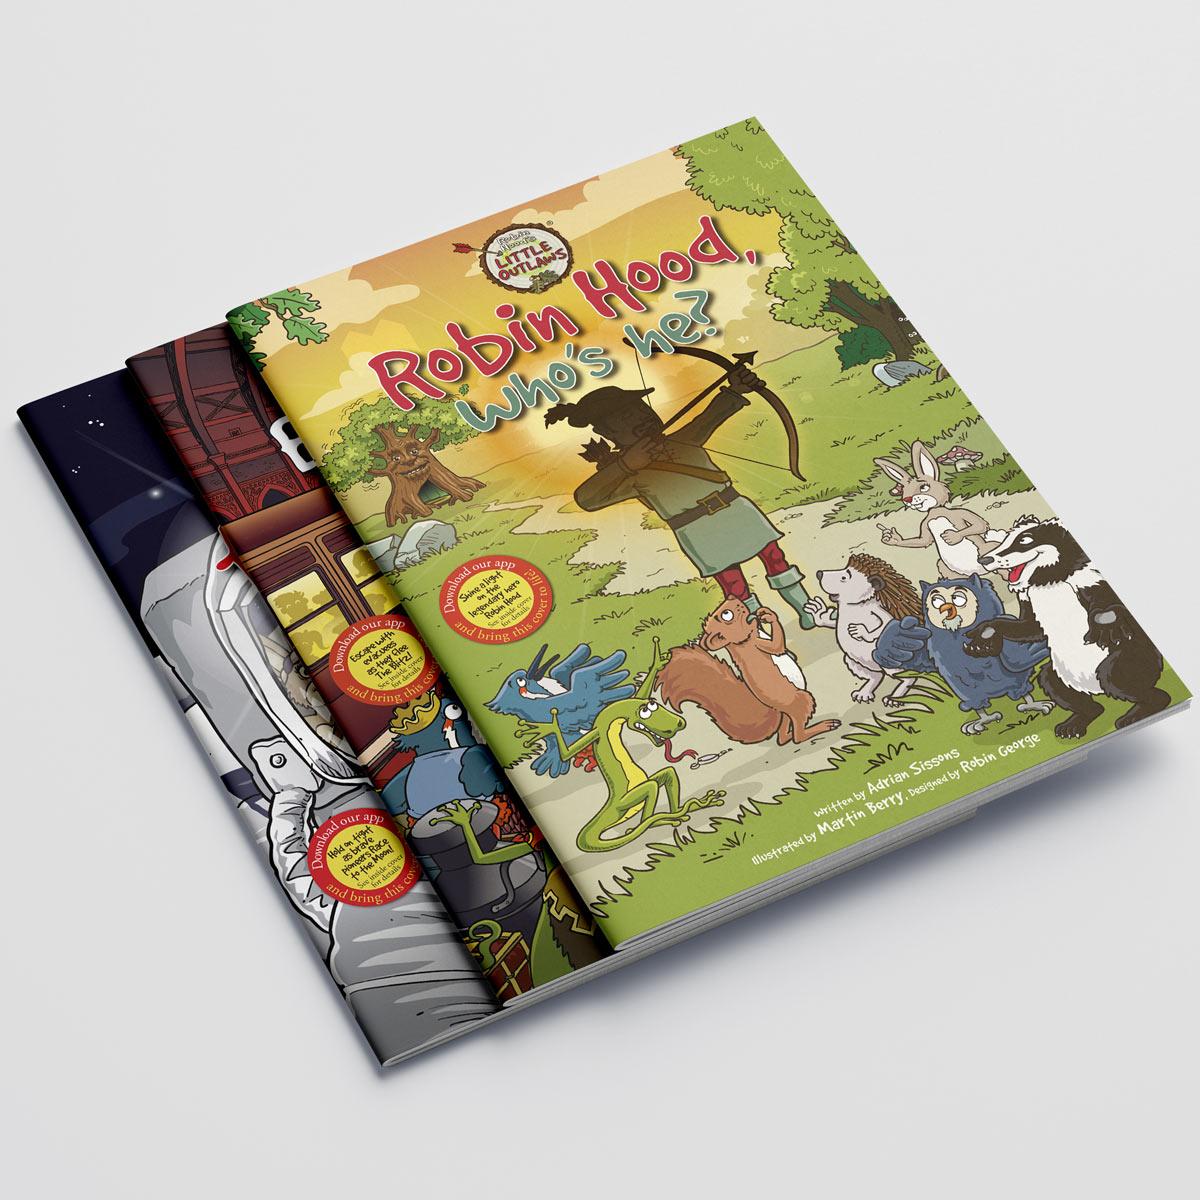 Robin Hood's Little Outlaws first three books